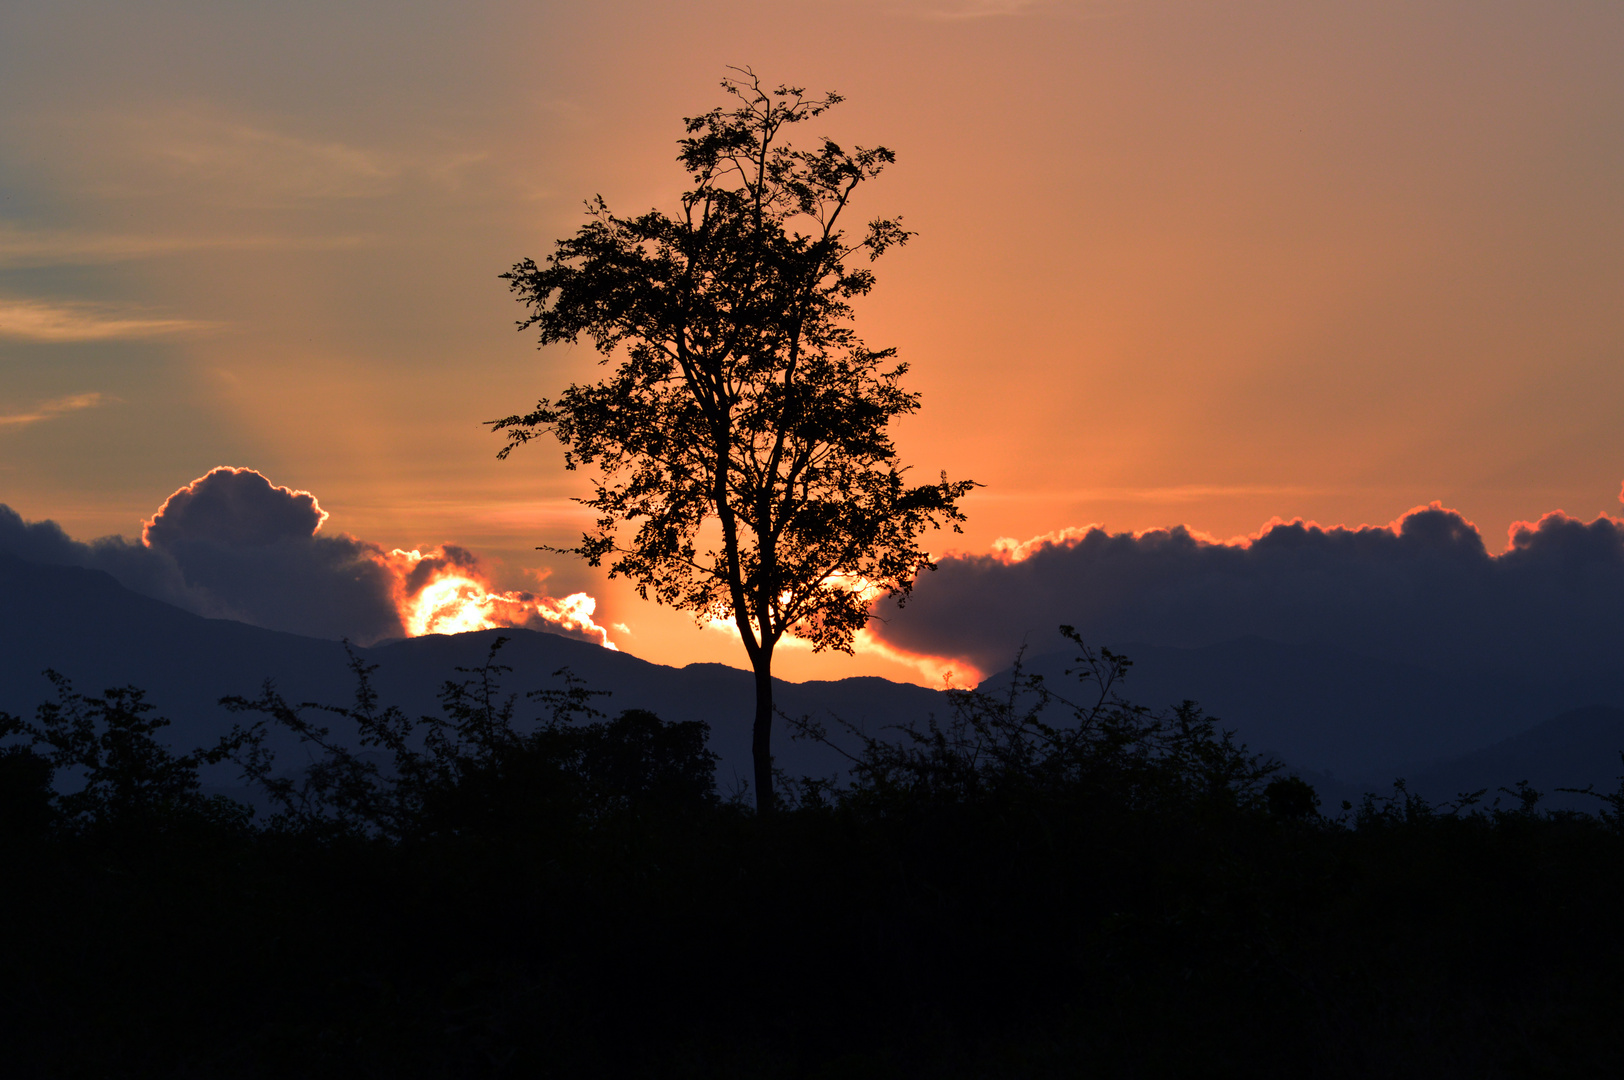 Sonnenuntergang auf Sri Lanka